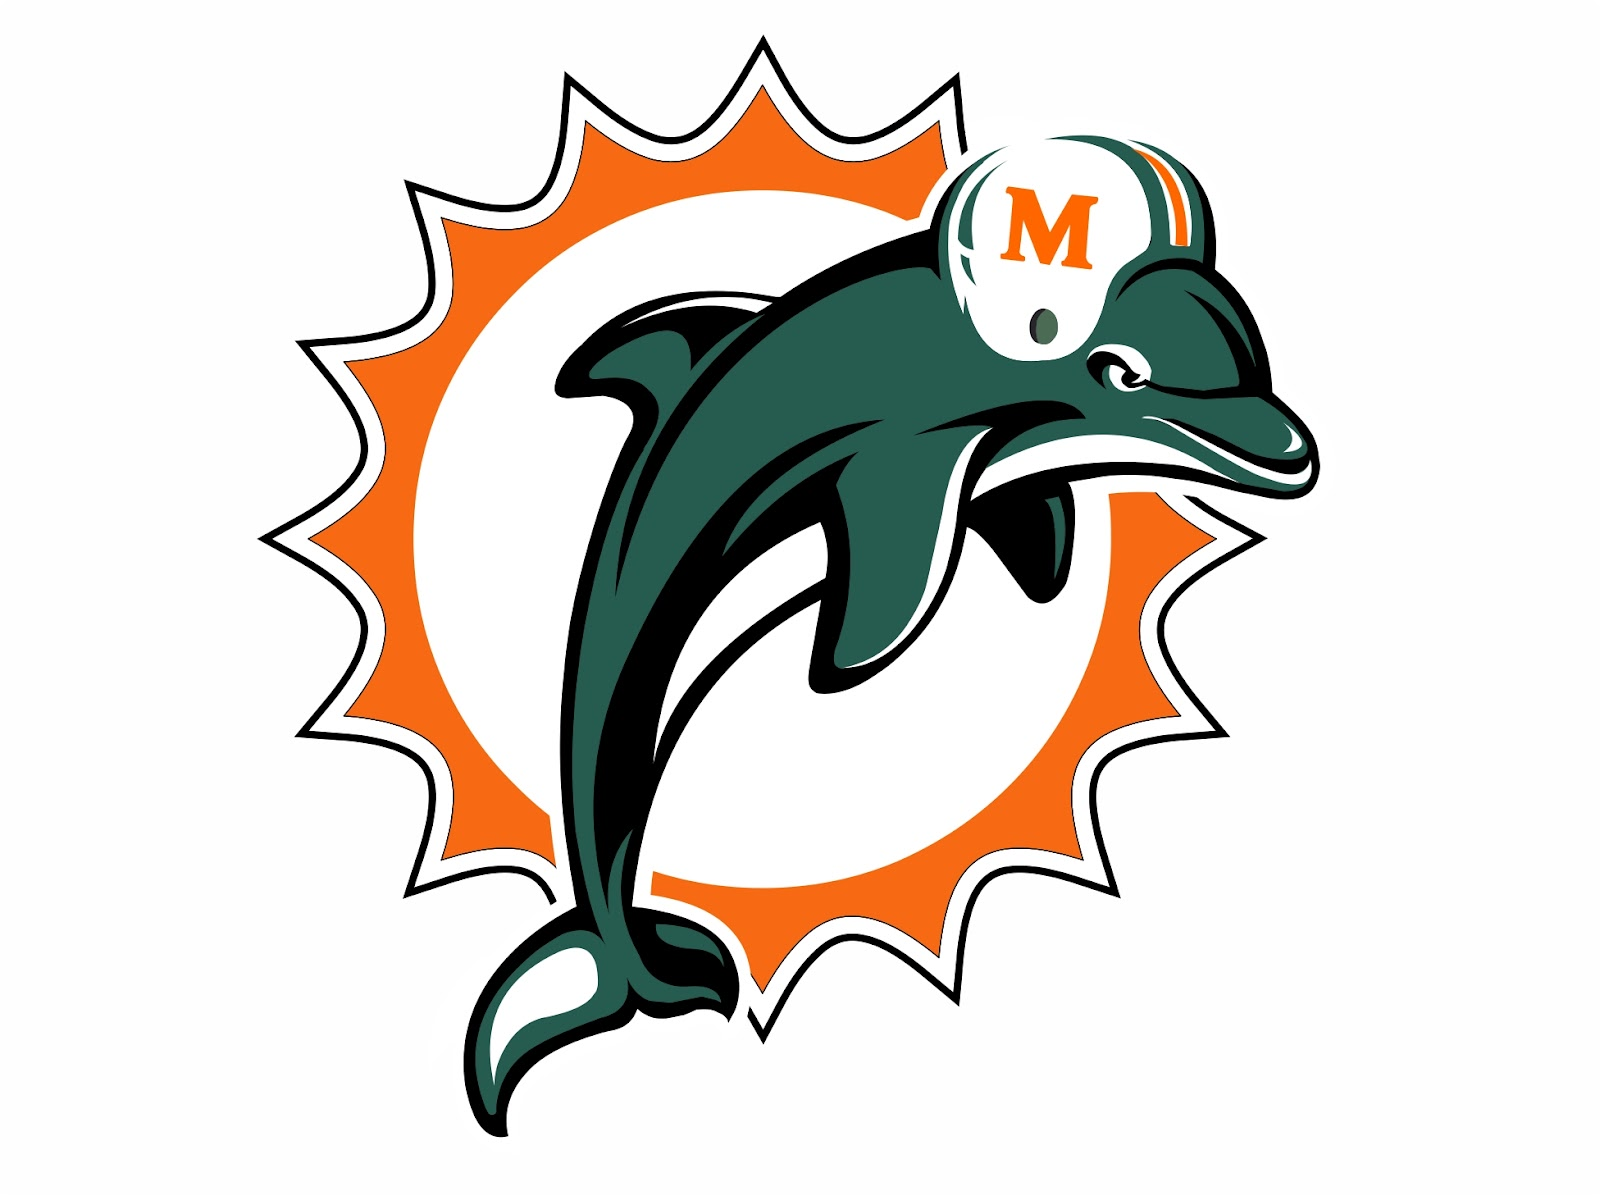 Miami Dolphins Logo Of American Football Team Free Image